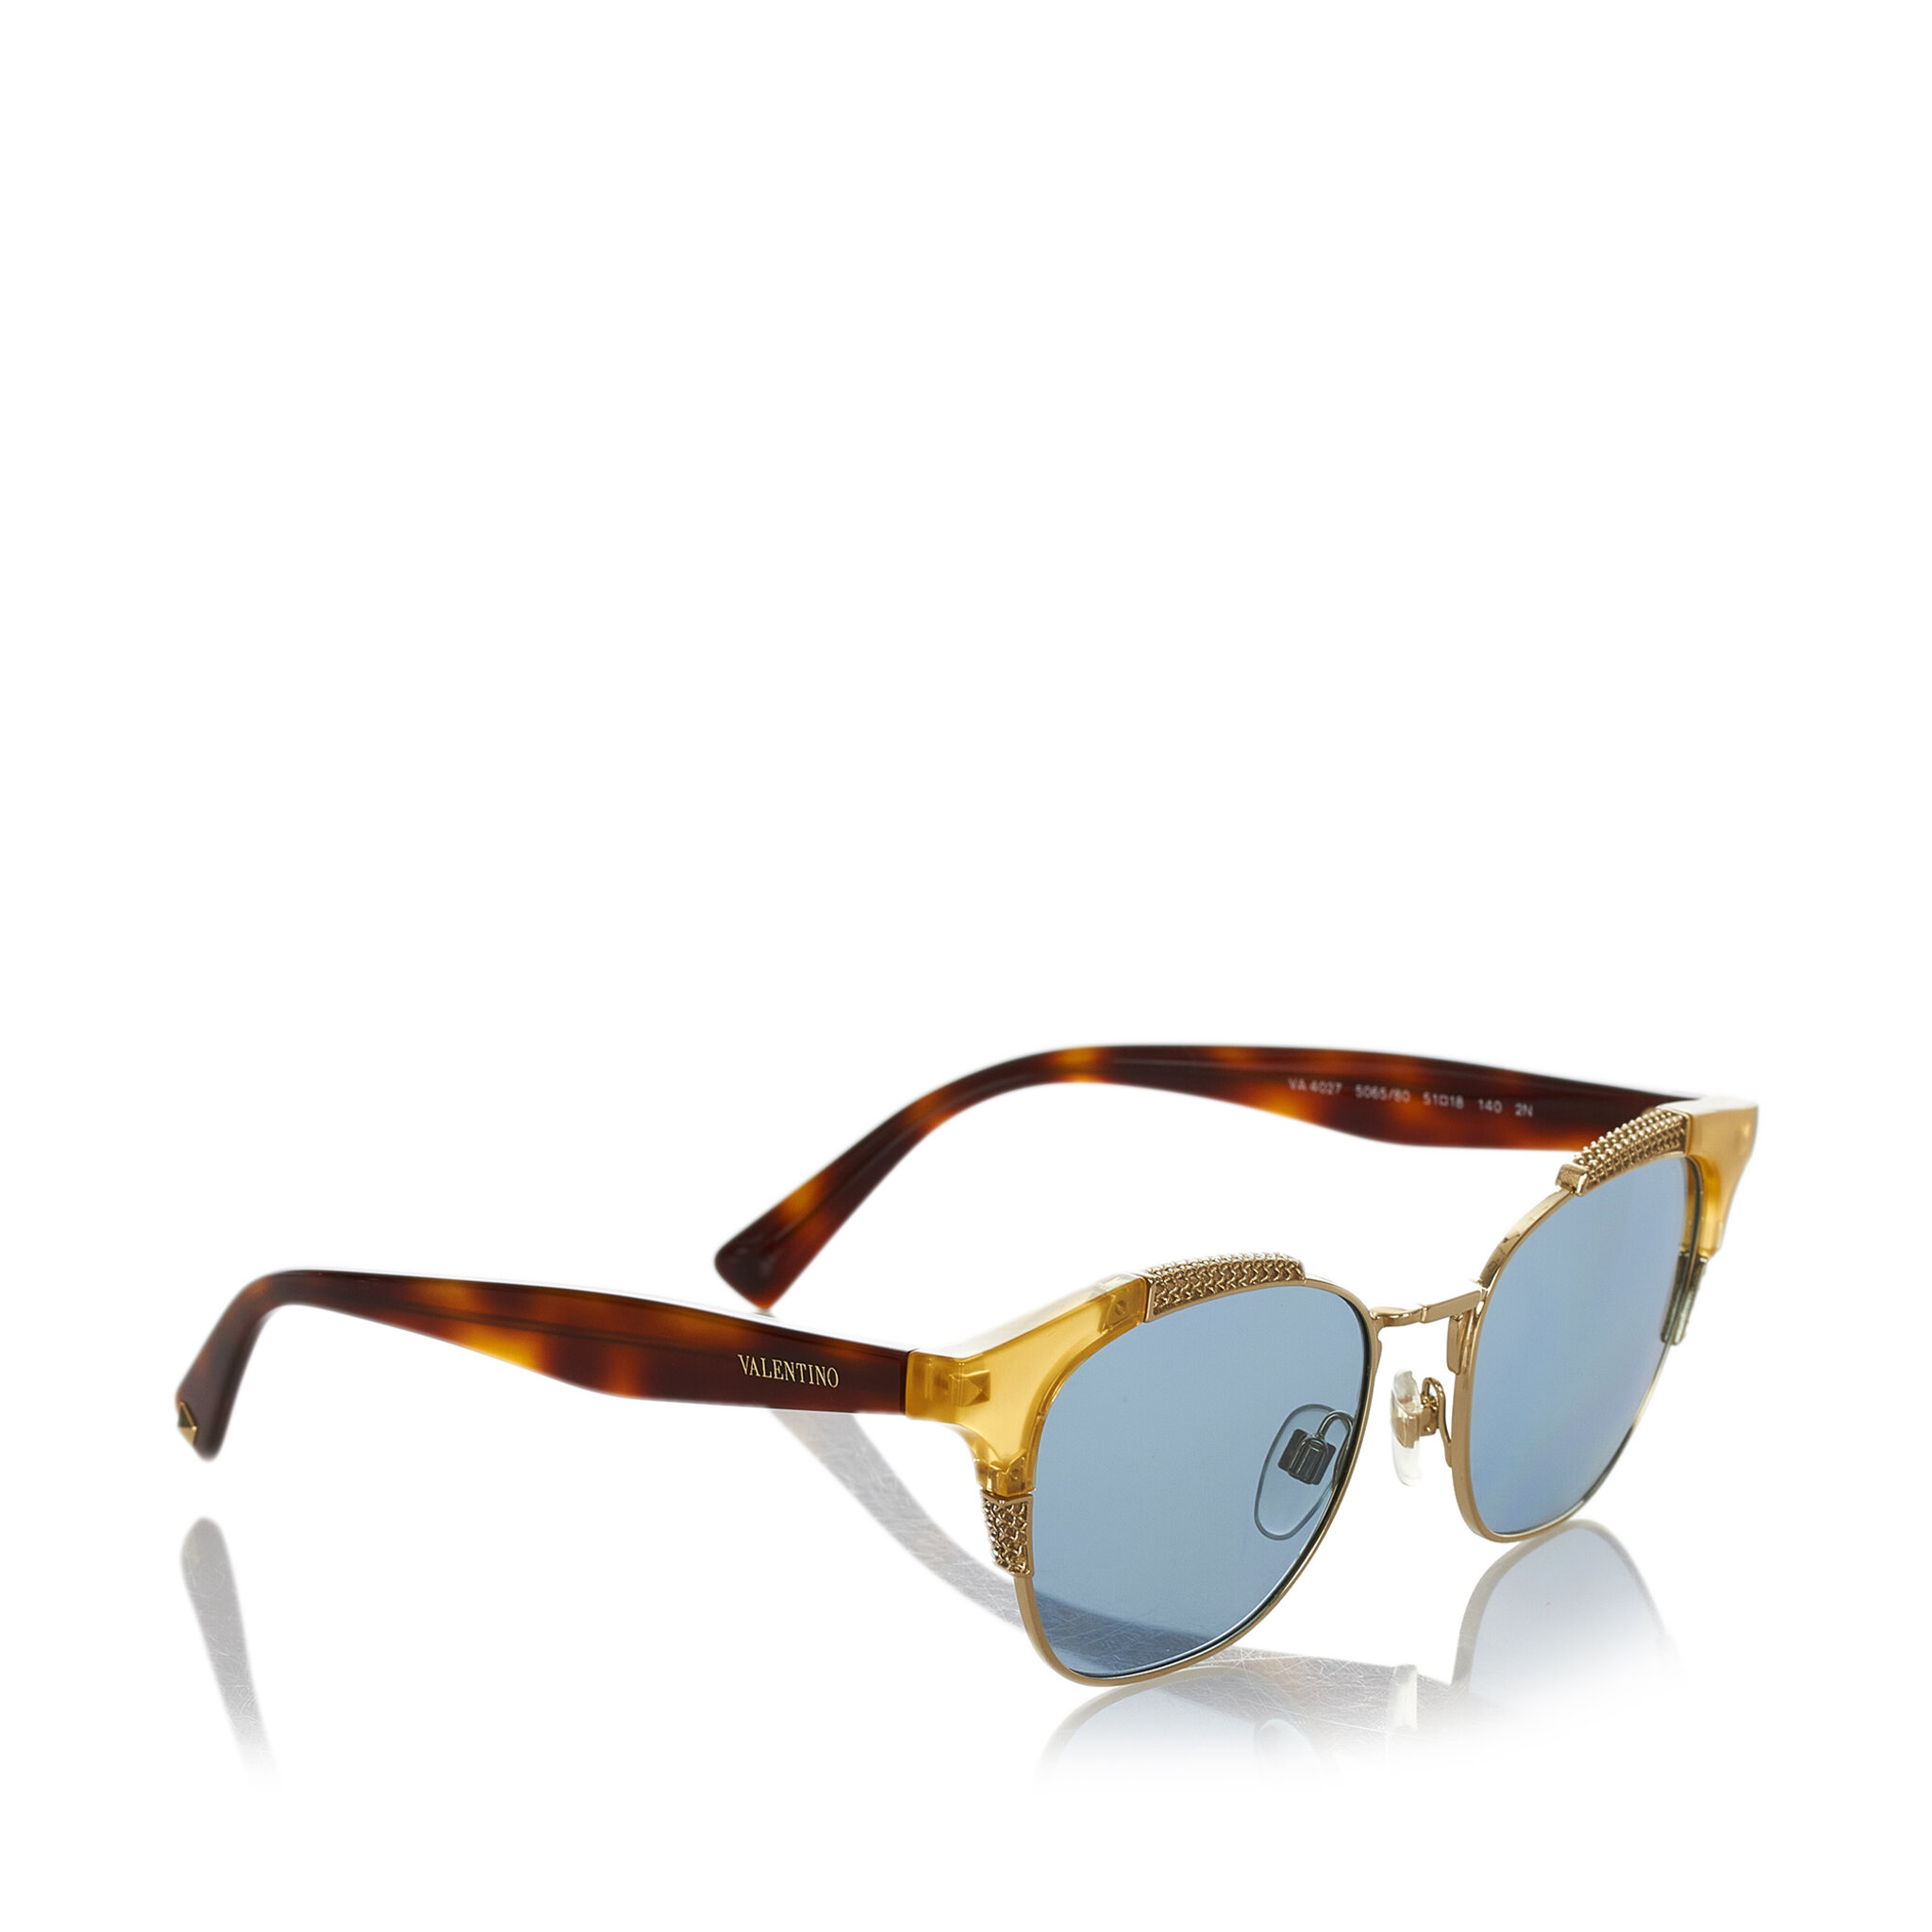 Valentino Half-rim Cate Eye Sunglasses, ONESIZE